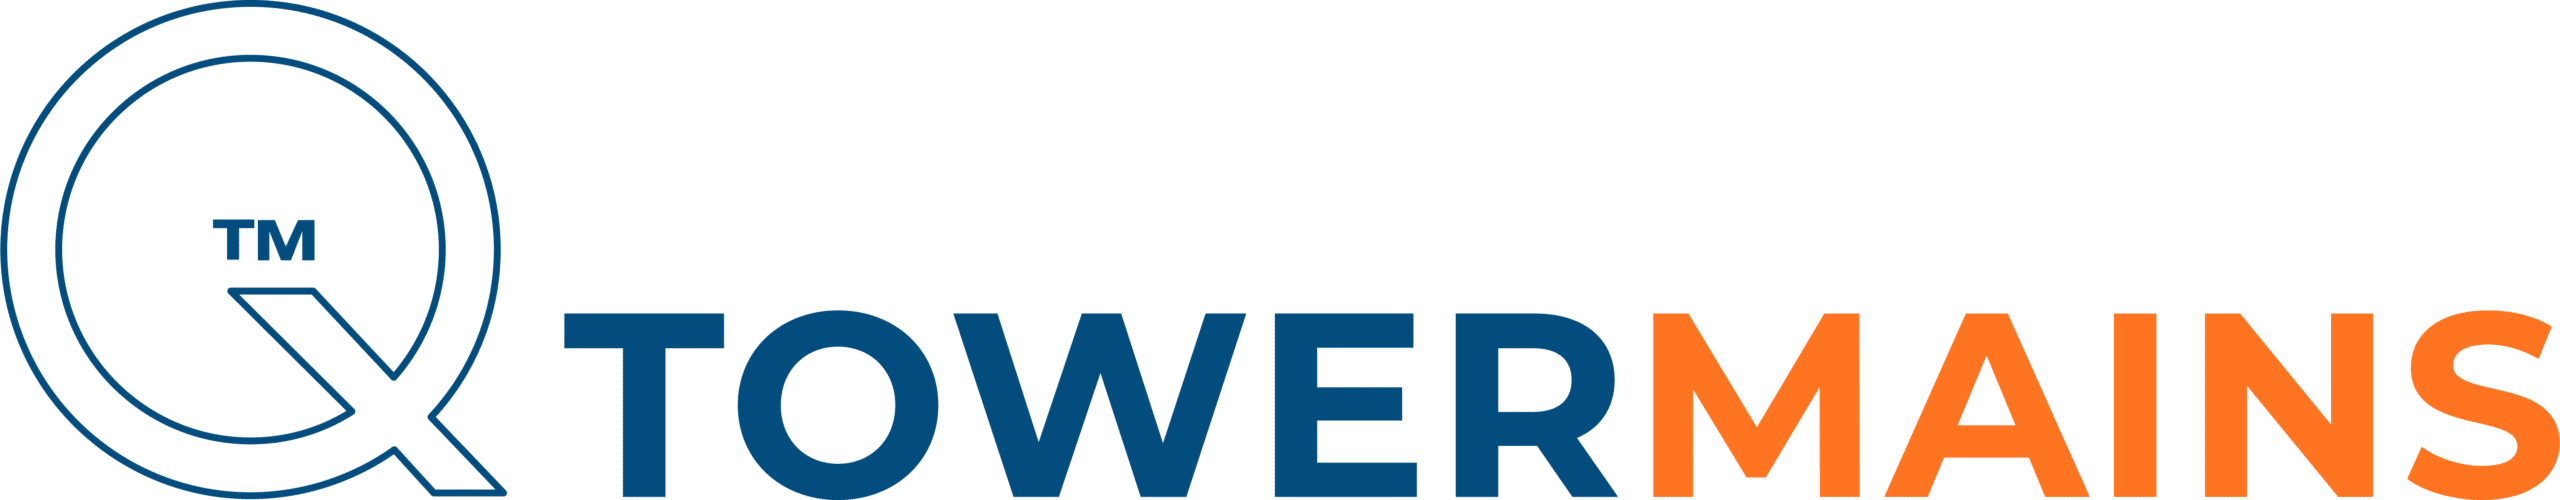 Tower Mains Logo